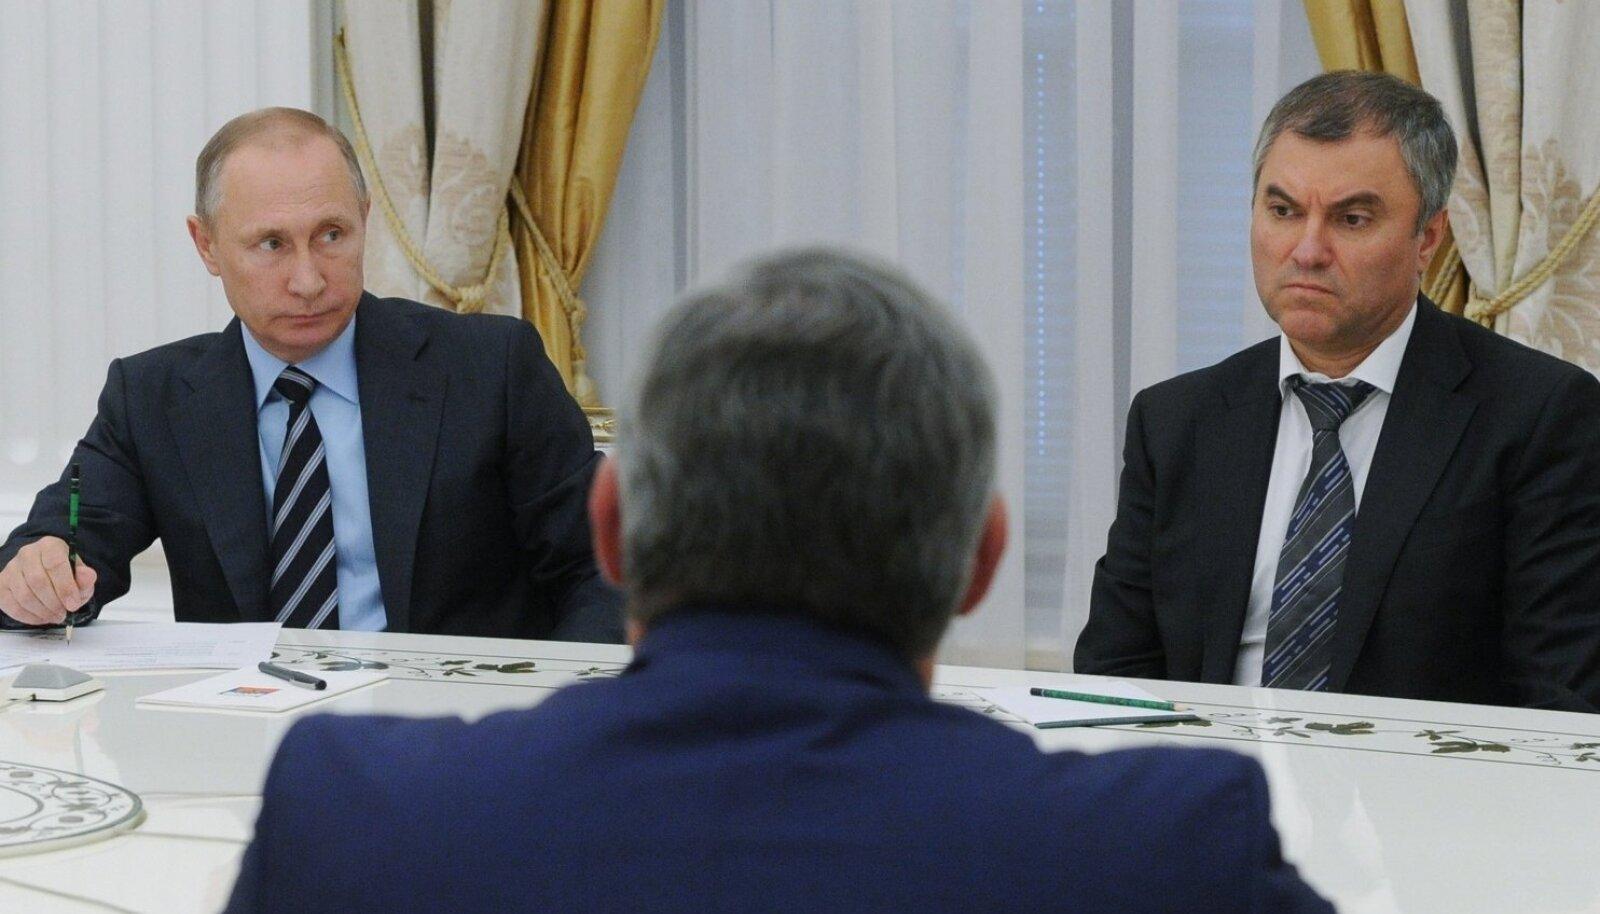 Vladimir Putin, Vjatšeslav Volodin